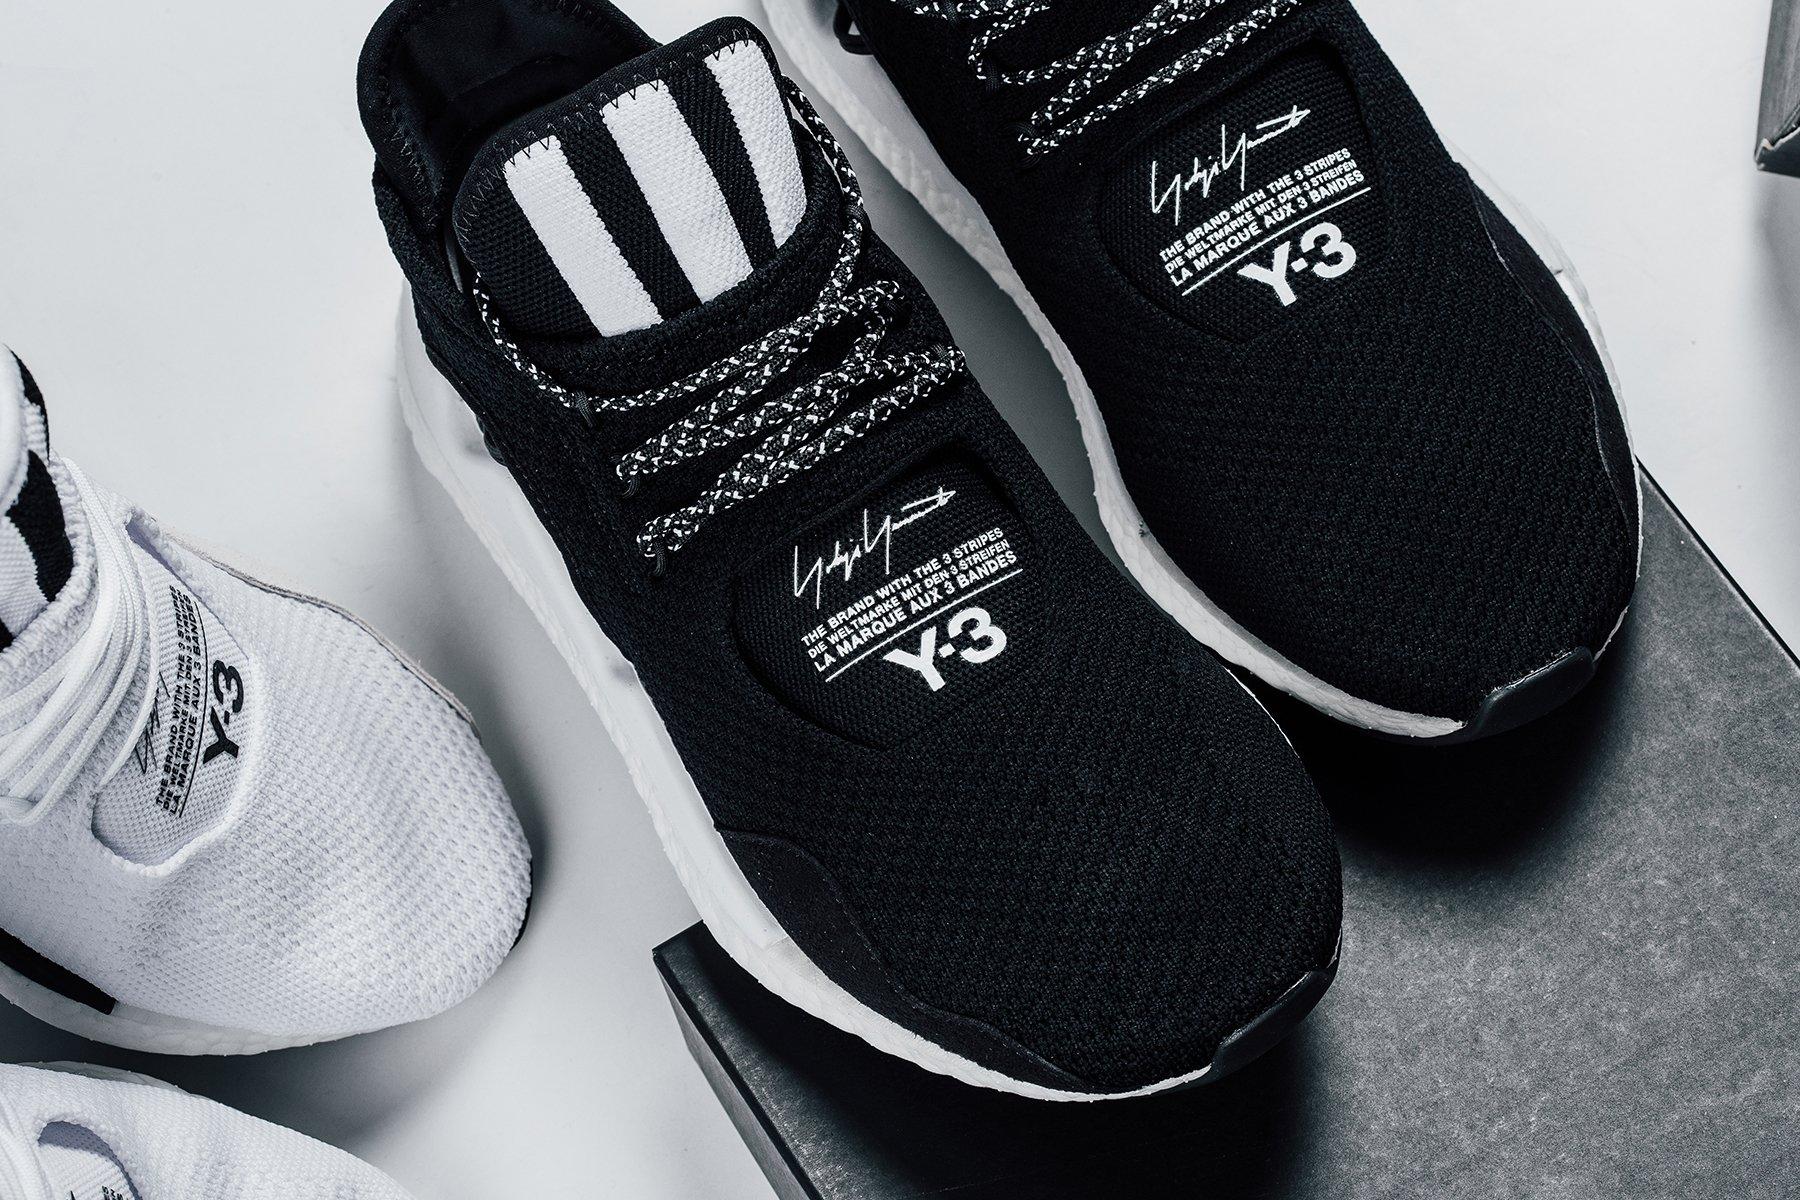 f05ed0075 Adidas introduce the new Y-3 Saikou